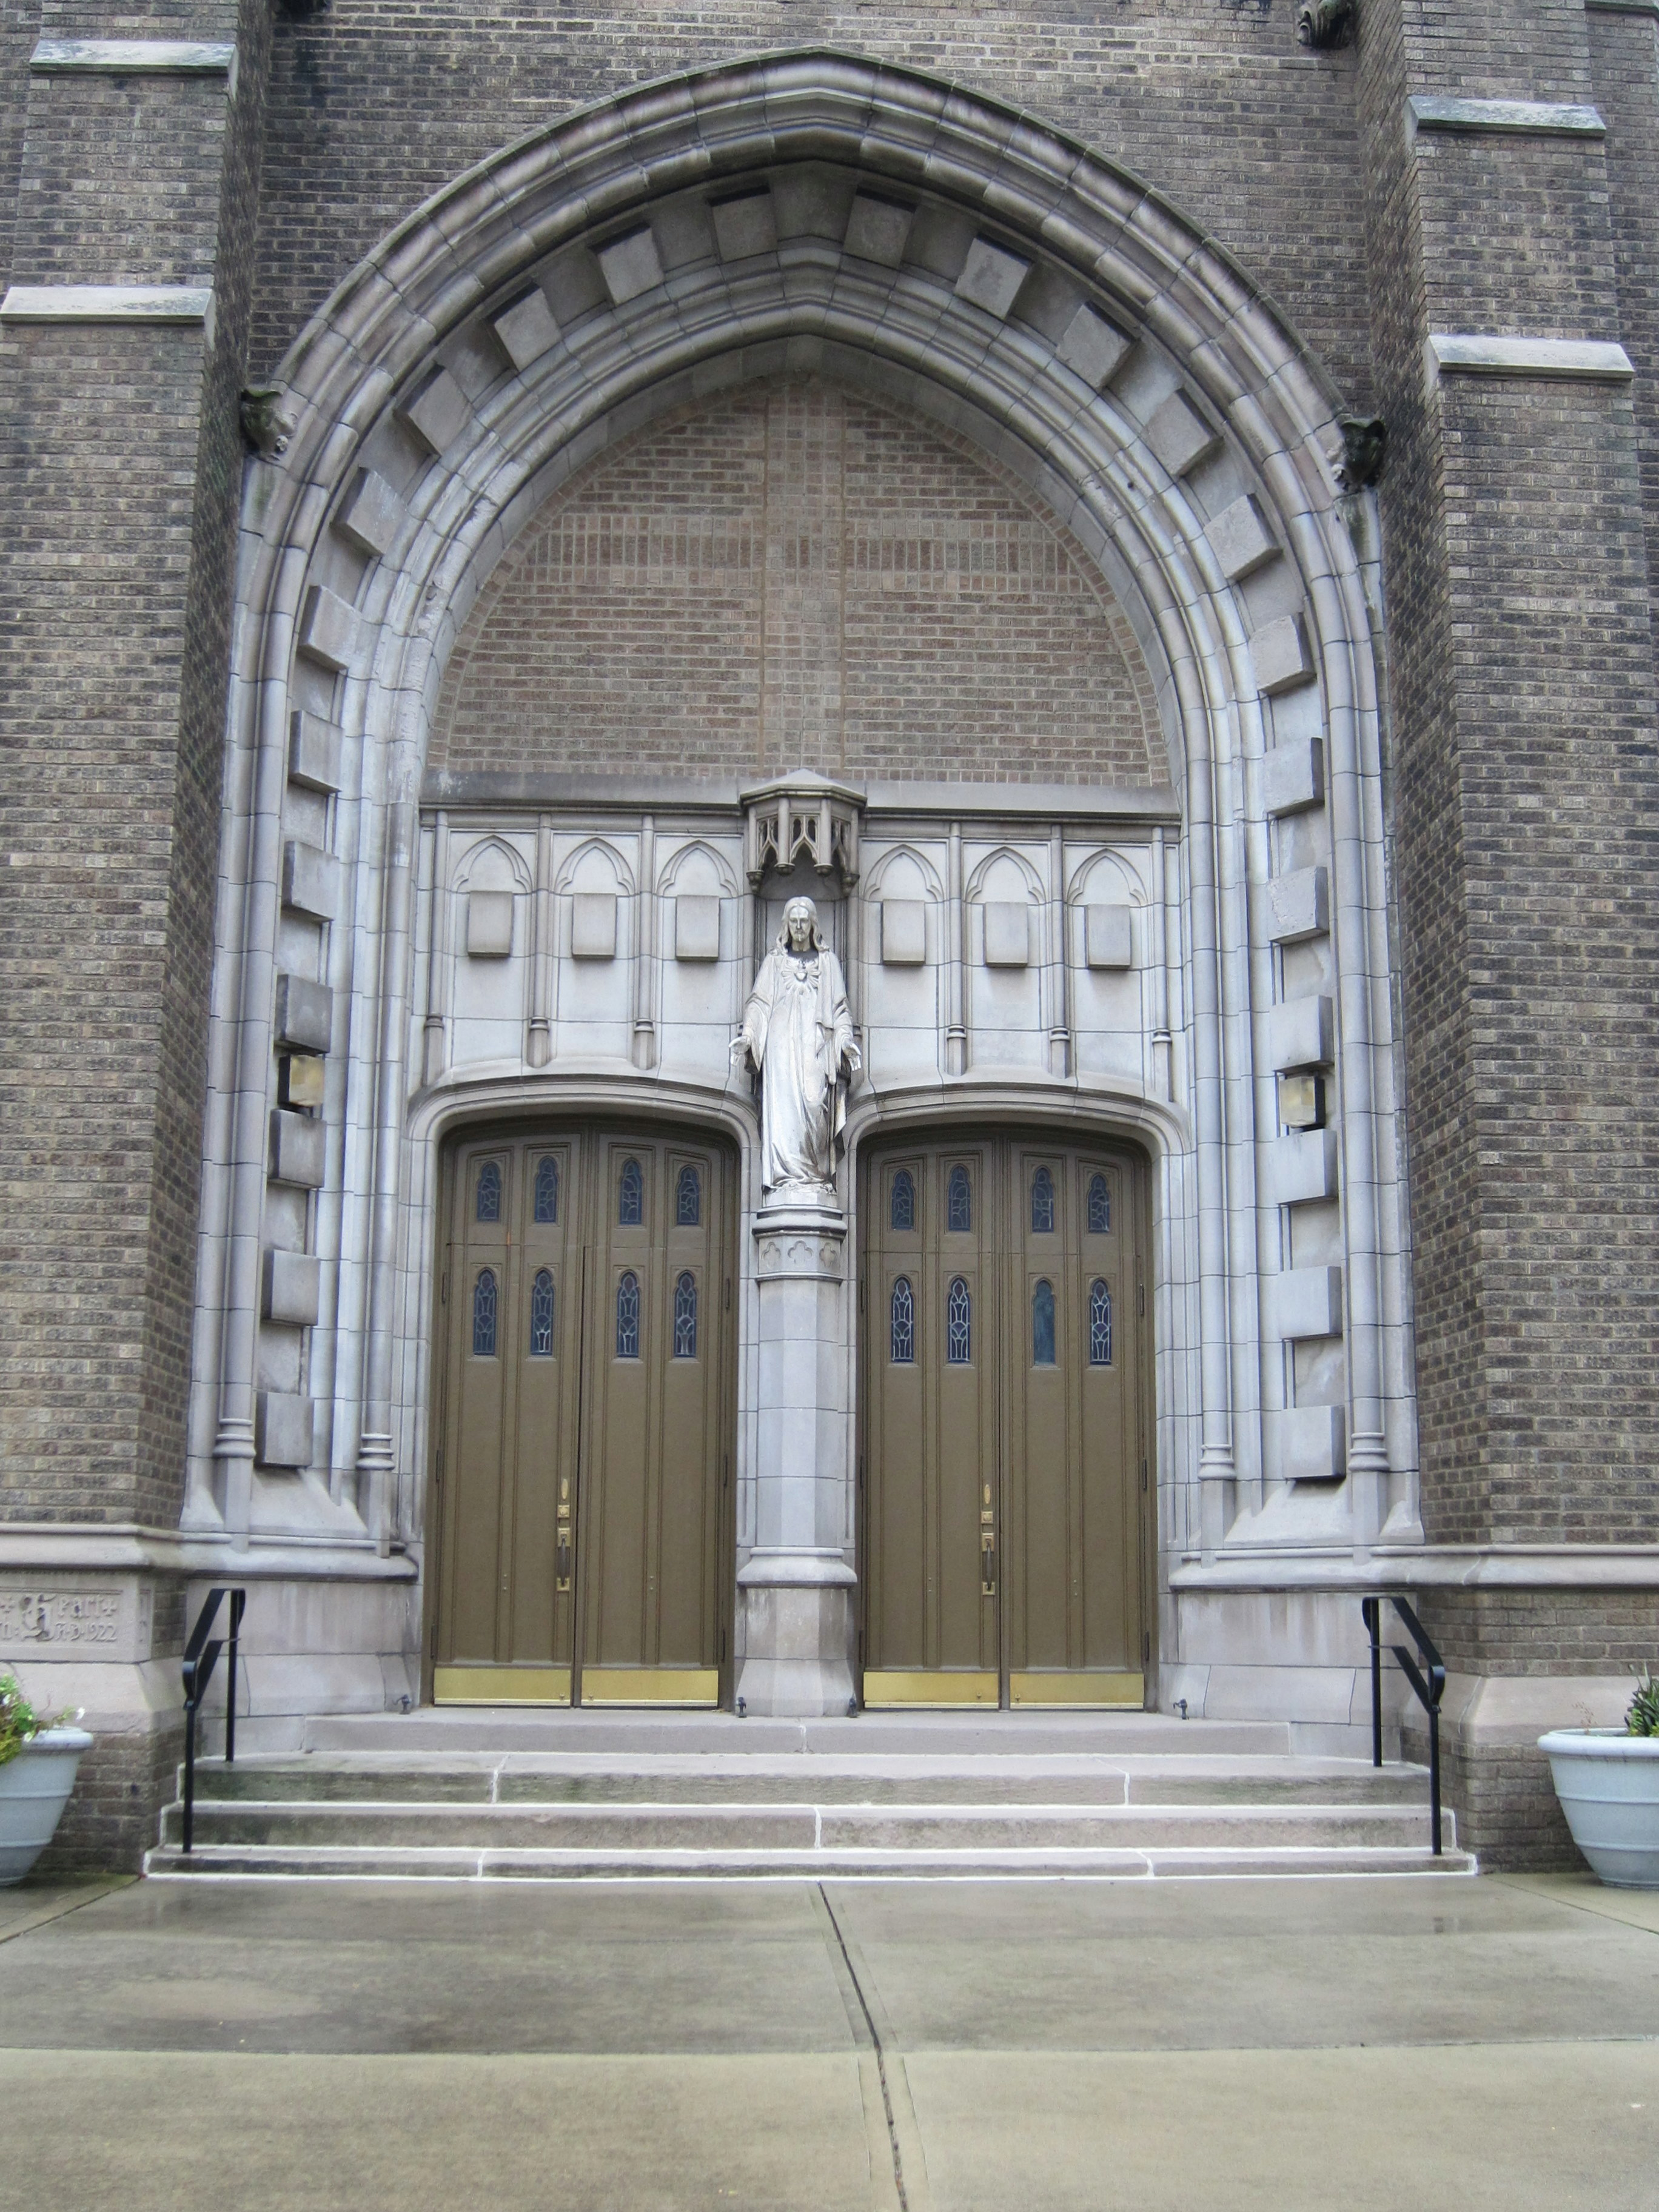 FileSacred Heart Church Columbus Ohio - front doors.jpg & File:Sacred Heart Church Columbus Ohio - front doors.jpg ...